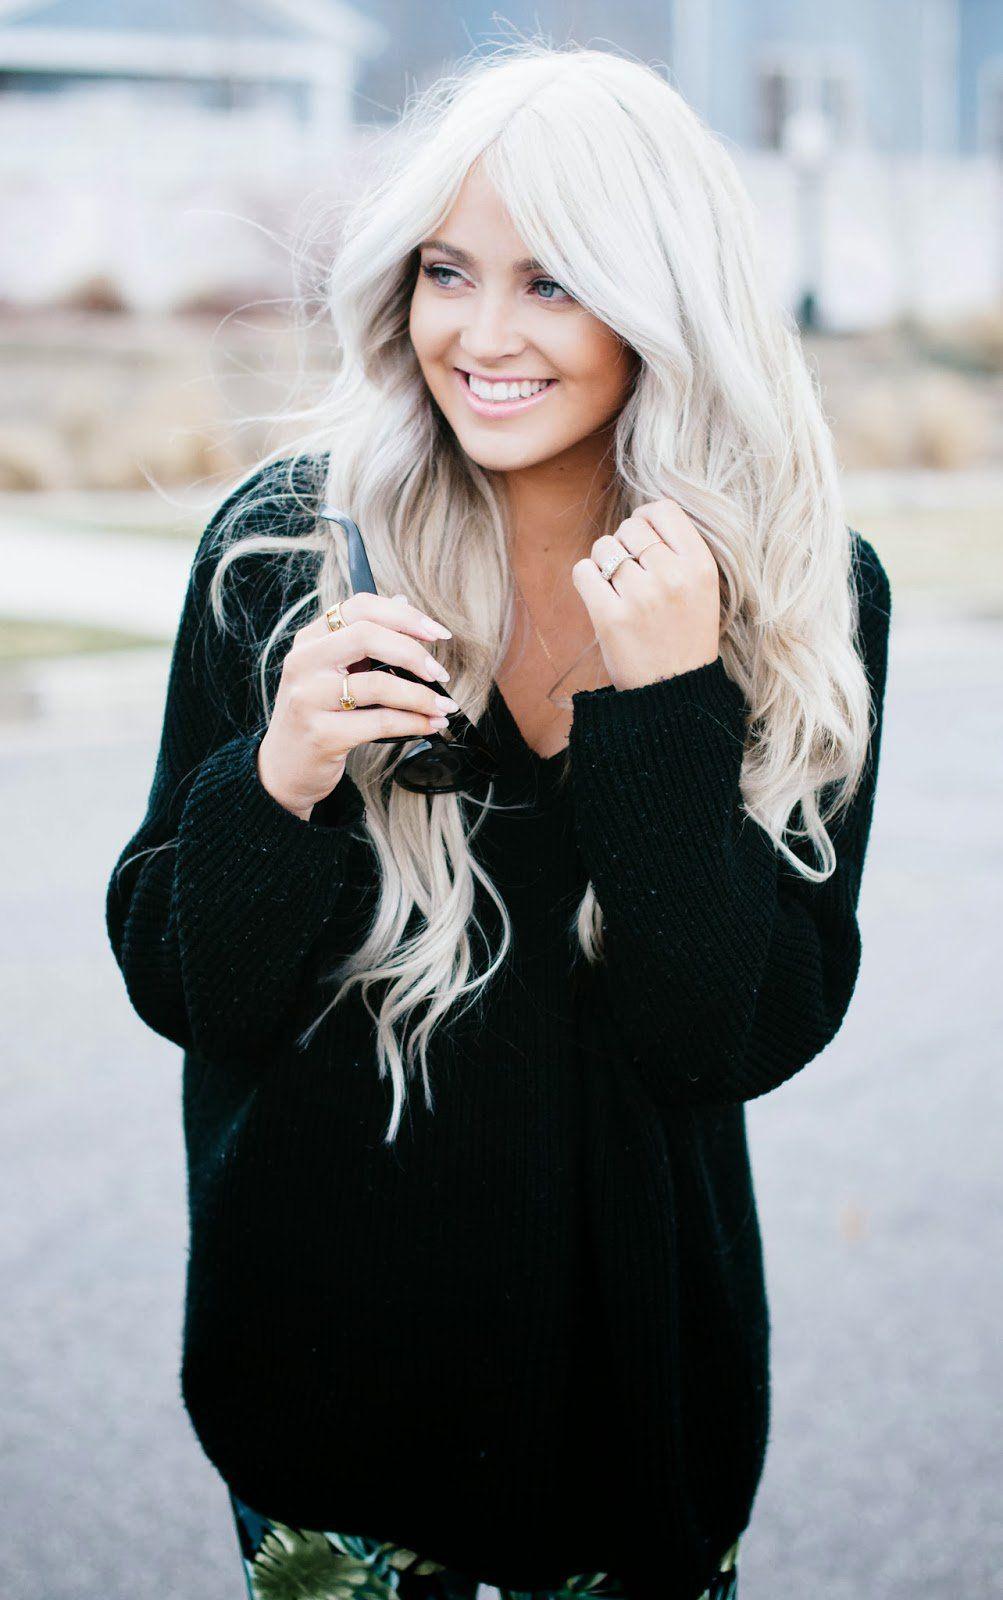 Cara Loren Cara Loren Hair Color Brand Is Matrix Toner Brand Is